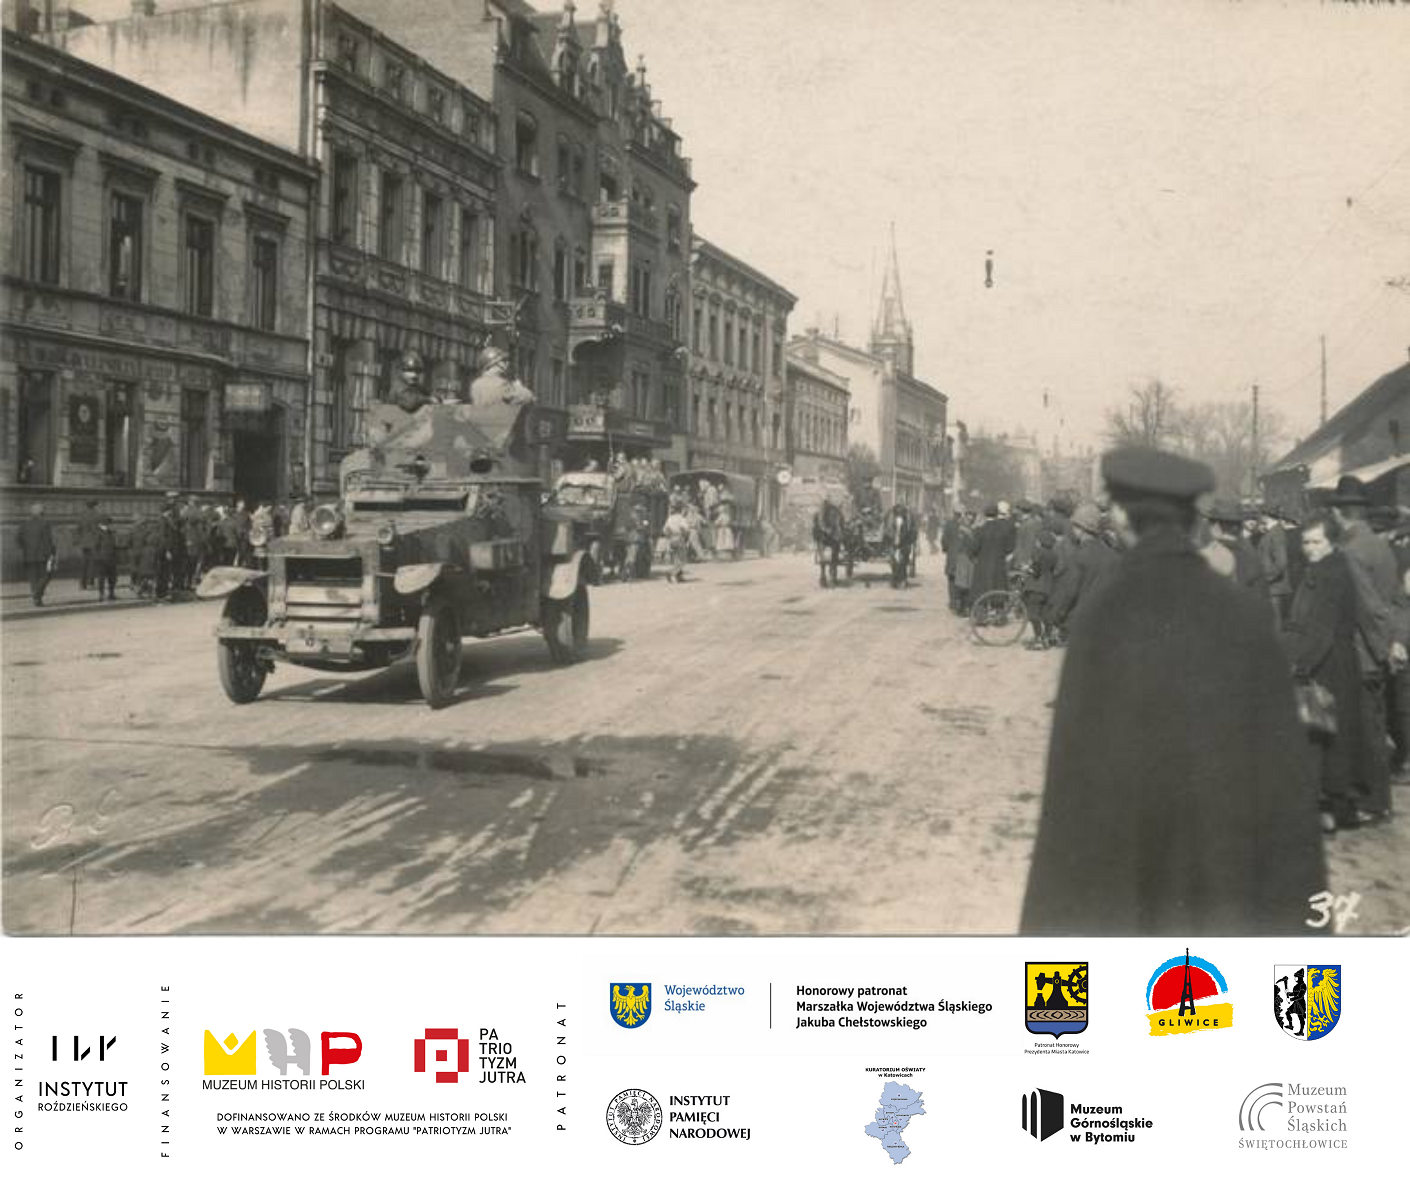 karta historyczna. Francuski samochód pancerny na Bahnhofstrasse (ul. Dworcowa) w Gliwicach, fot. P. Gollan, 26 VI 1921 r.